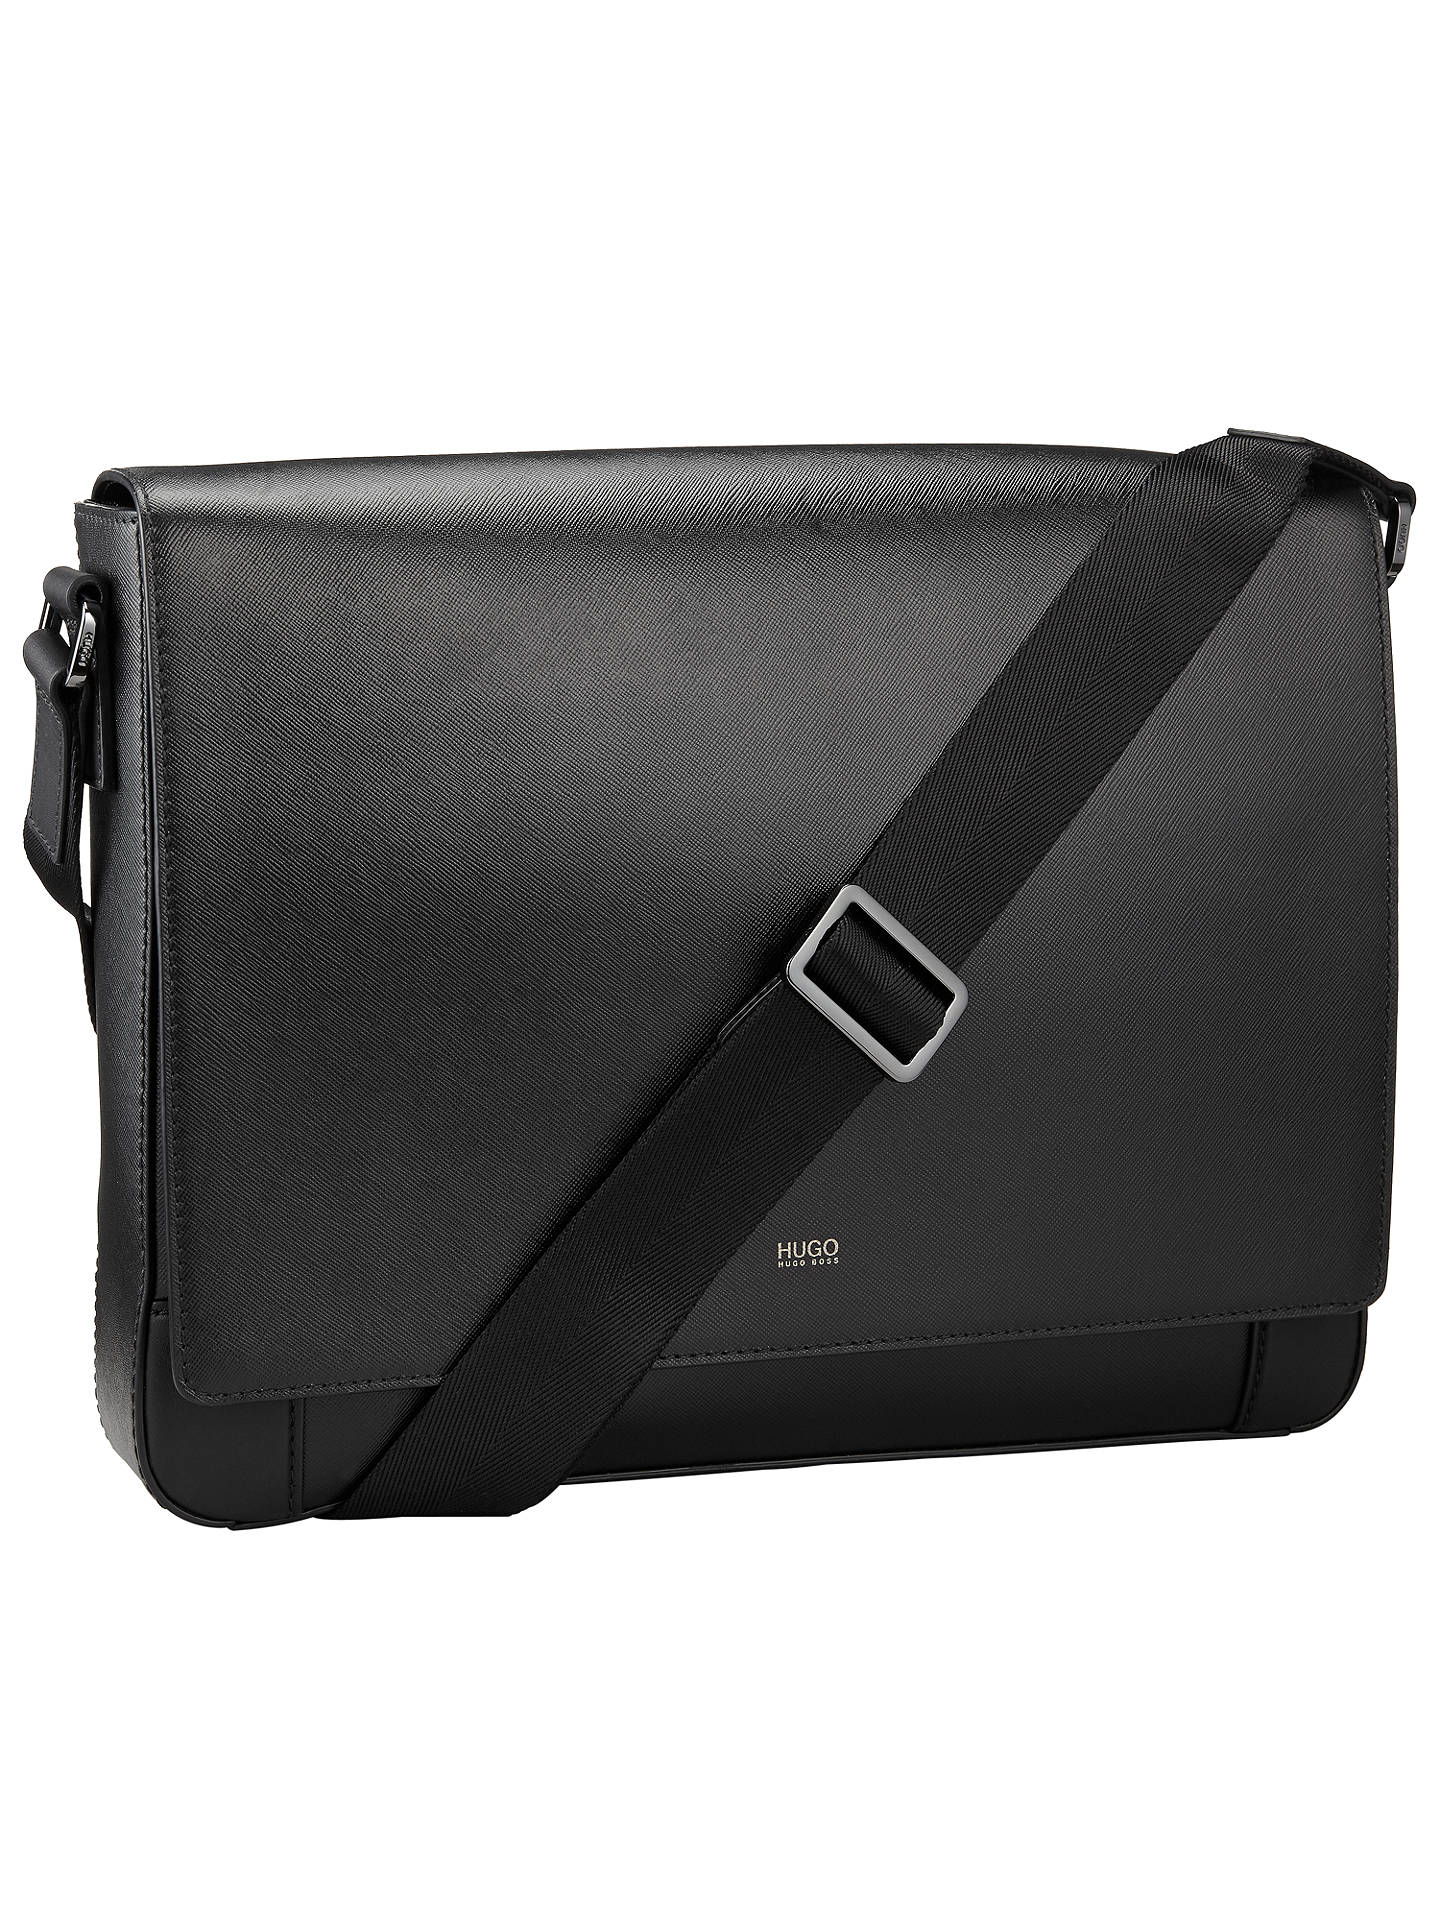 2411eb7680e ... Buy HUGO by Hugo Boss Digital Leather Messenger Bag, Black Online at  johnlewis.com ...